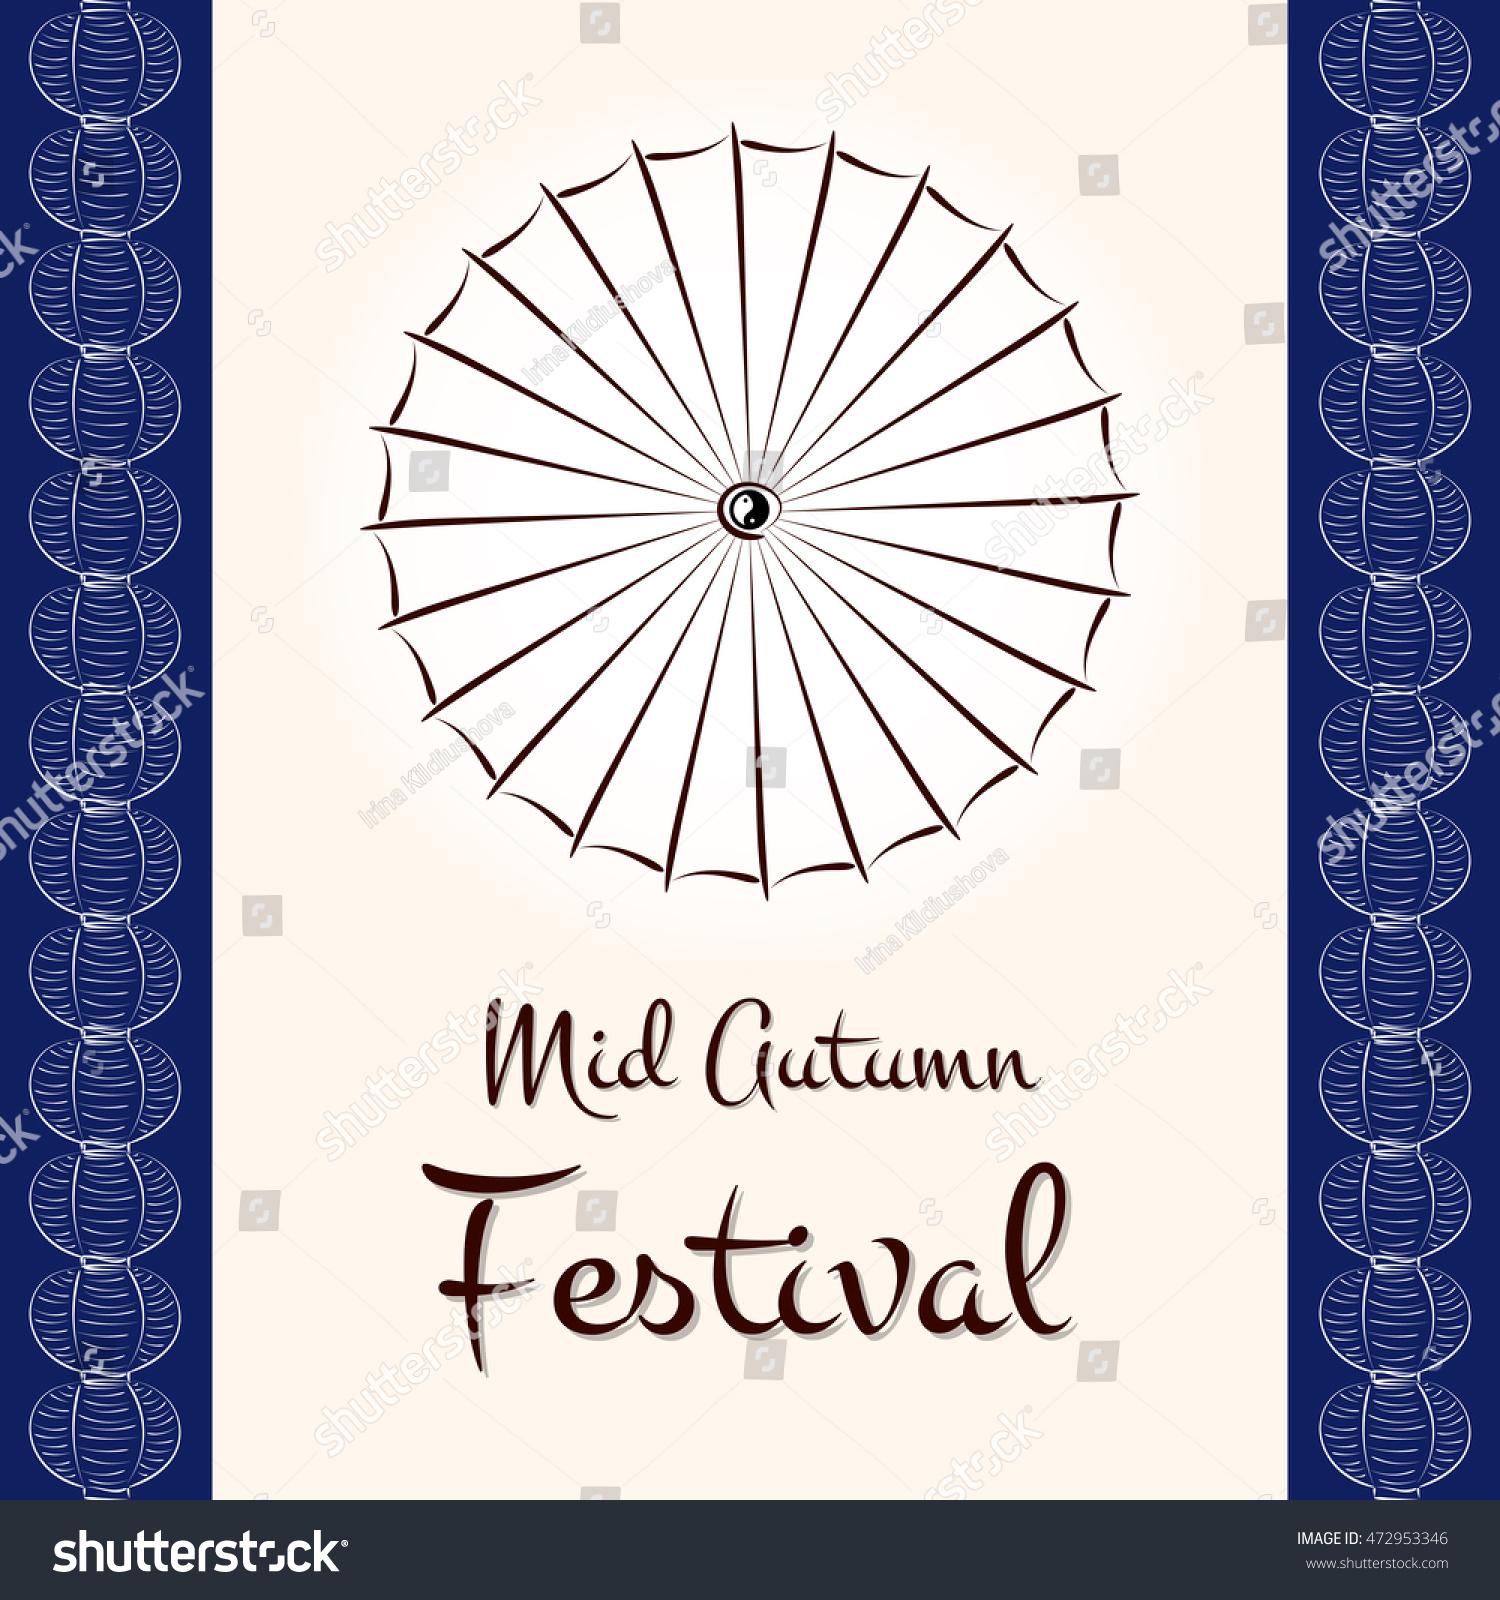 Mid autumn festival vector chuseok festive stock vector 472953346 mid autumn festival vector chuseok festive illustration with paper umbrella as moon kristyandbryce Choice Image